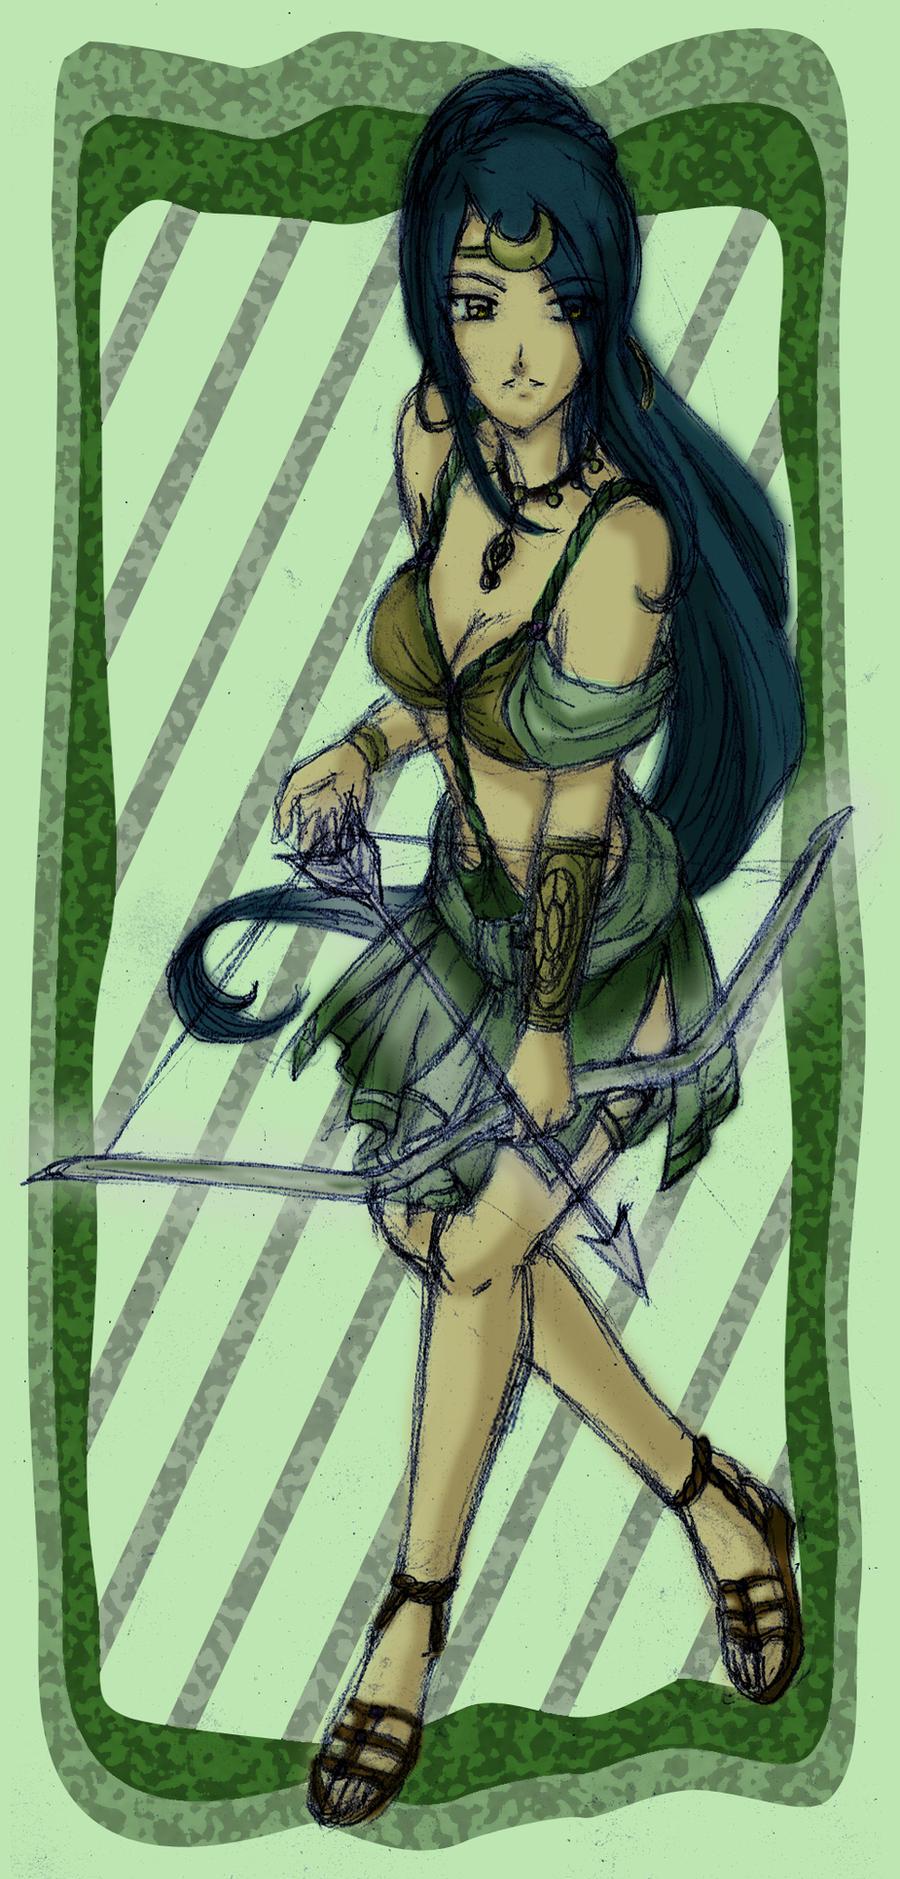 Artemis by lordaphaius28 on DeviantArt